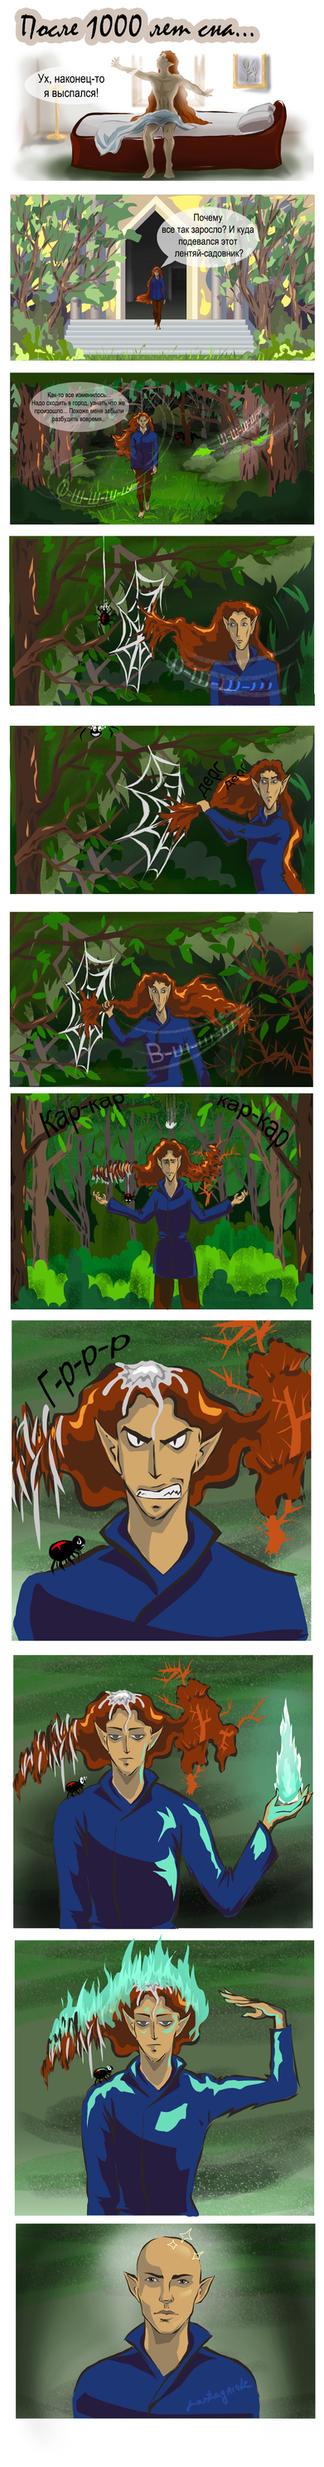 Dragon Age - Comics (Solas) by Lantagriele